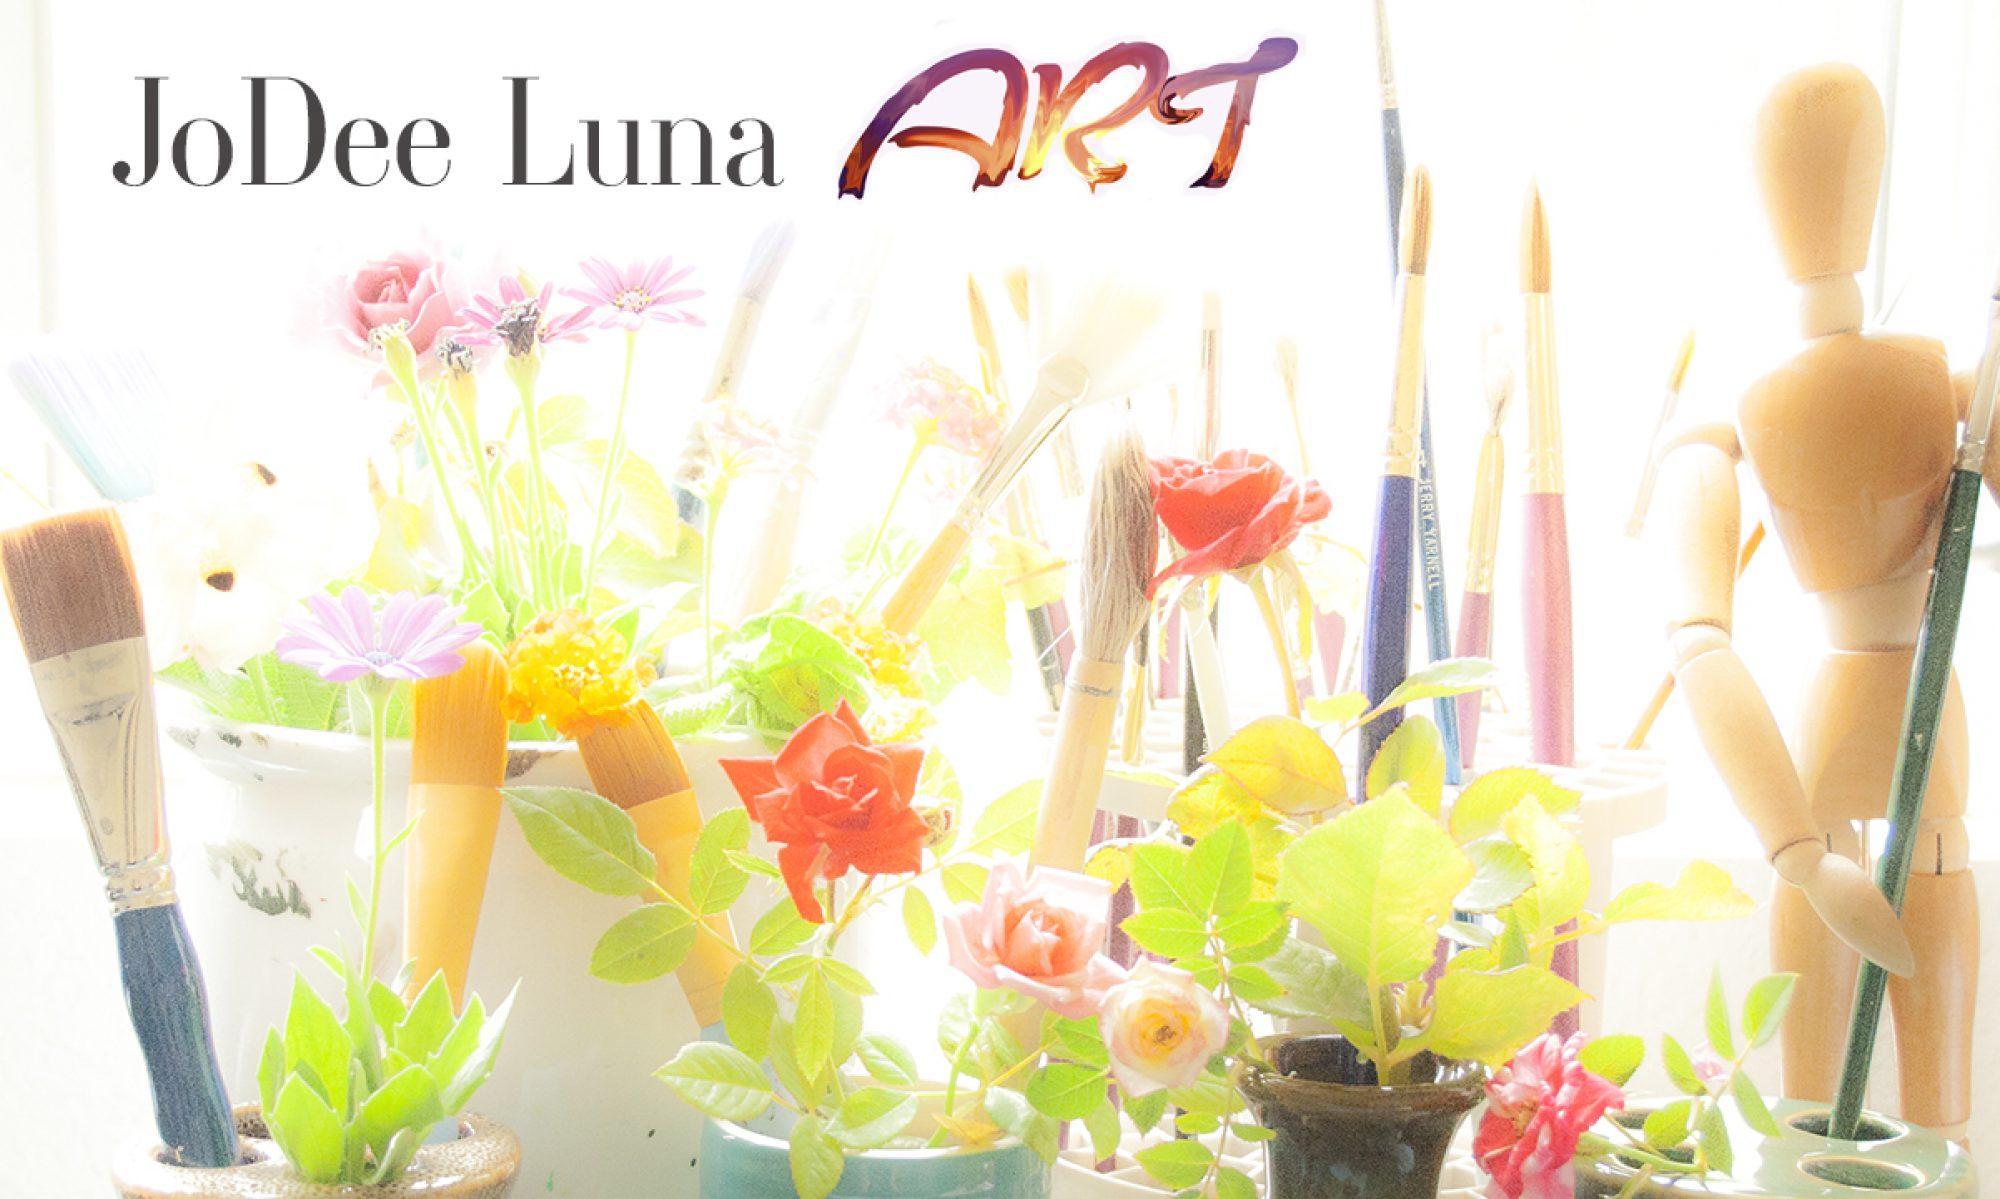 JoDee Luna Art